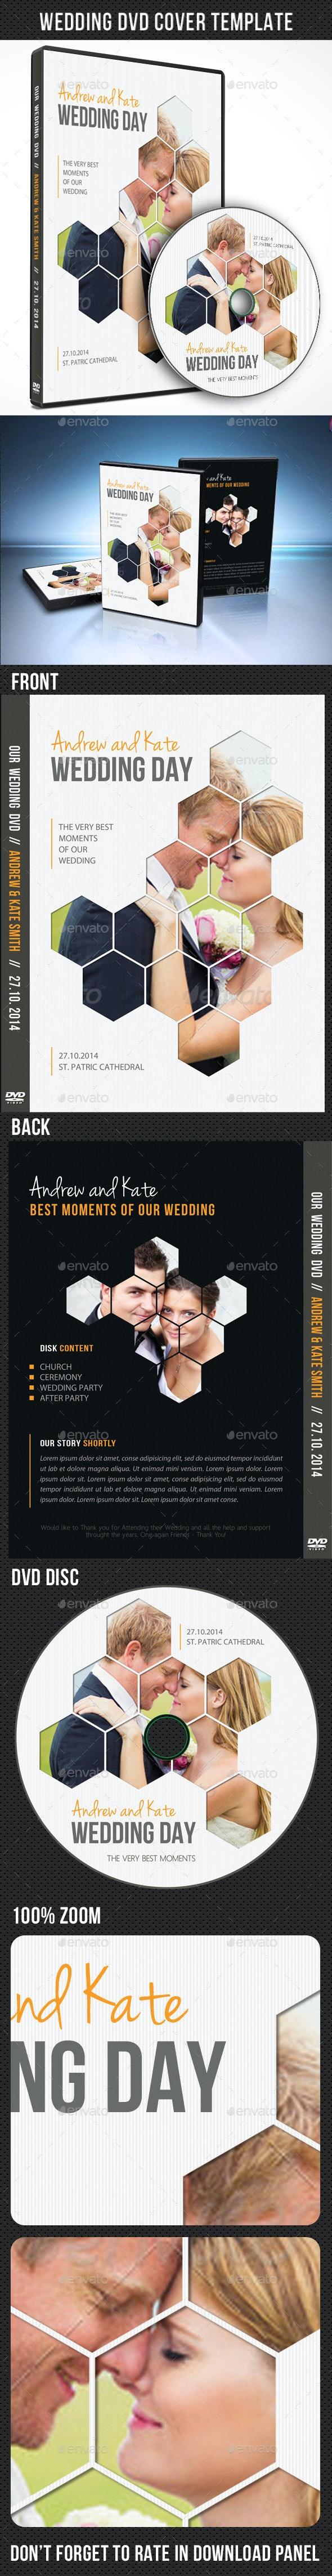 Wedding DVD Cover Template 06 - CD & DVD Artwork Print Templates